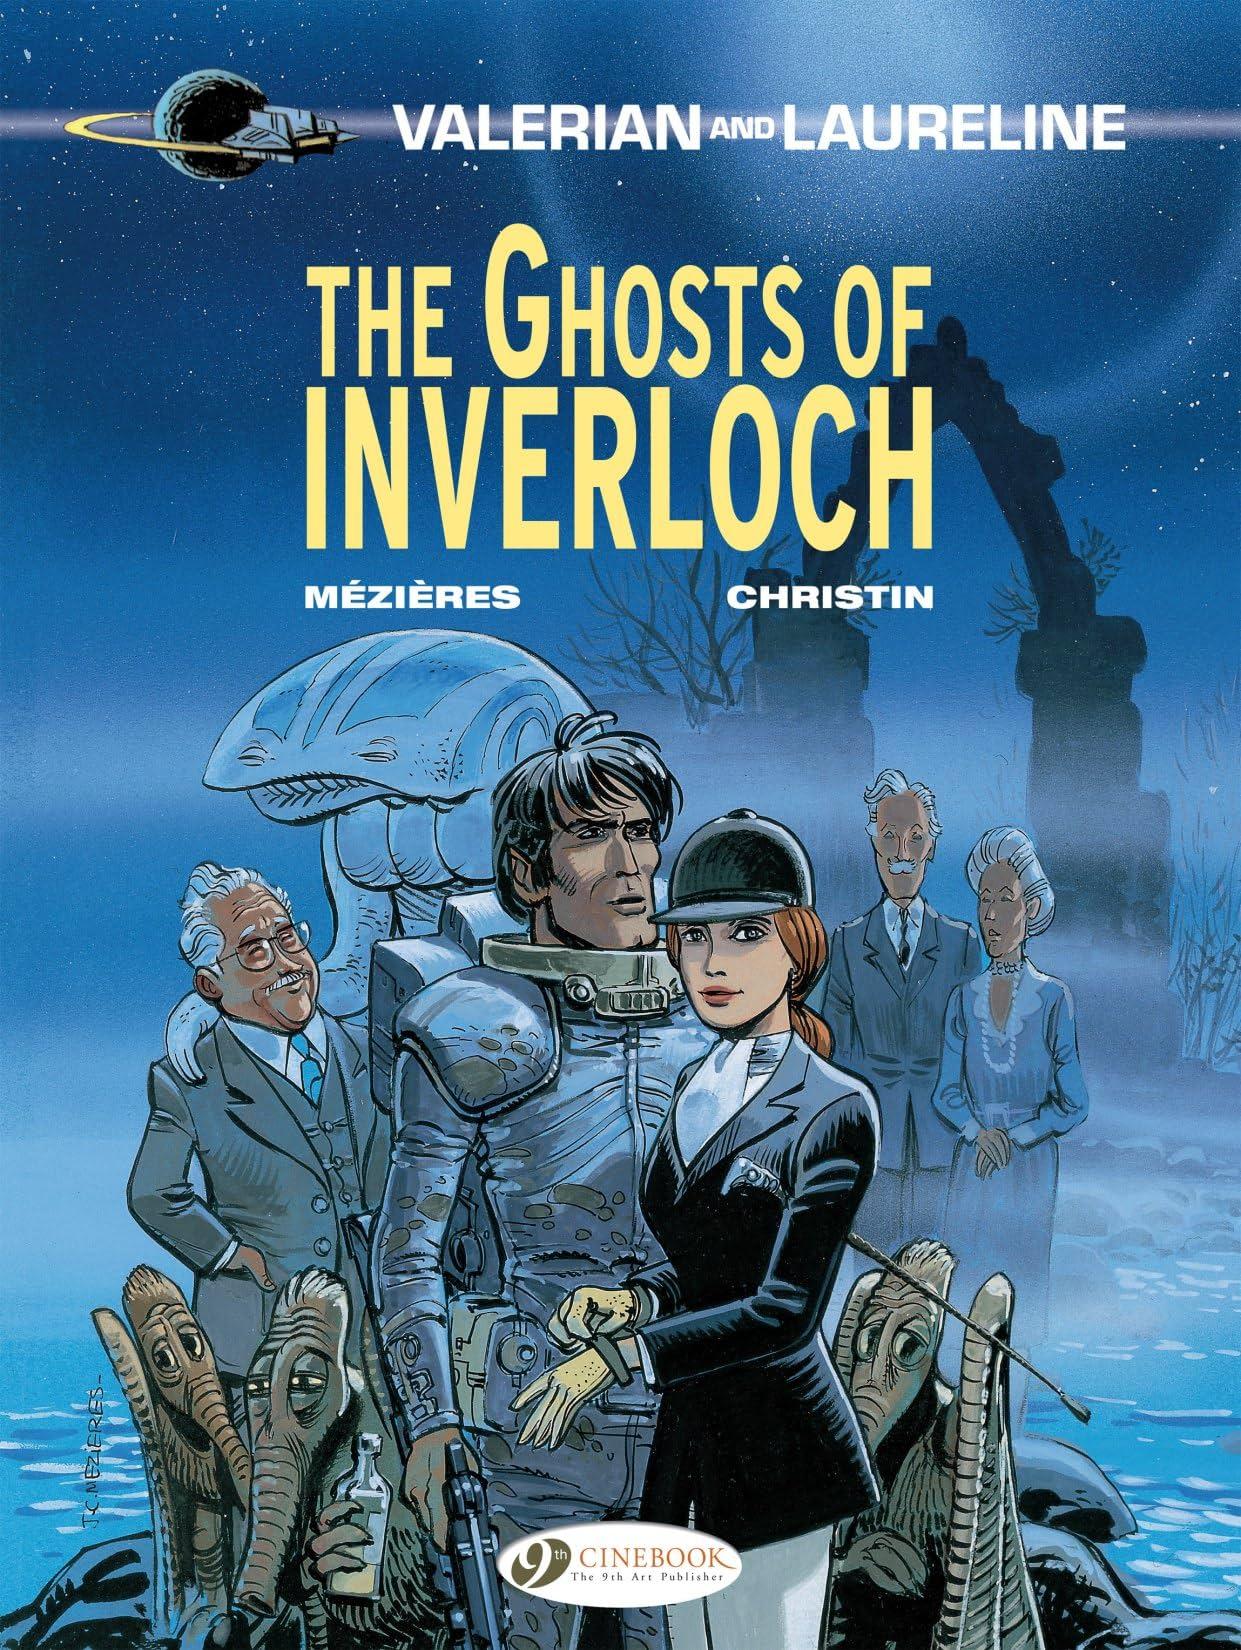 Valerian and Laureline Vol. 11: The Ghosts of Inverloch